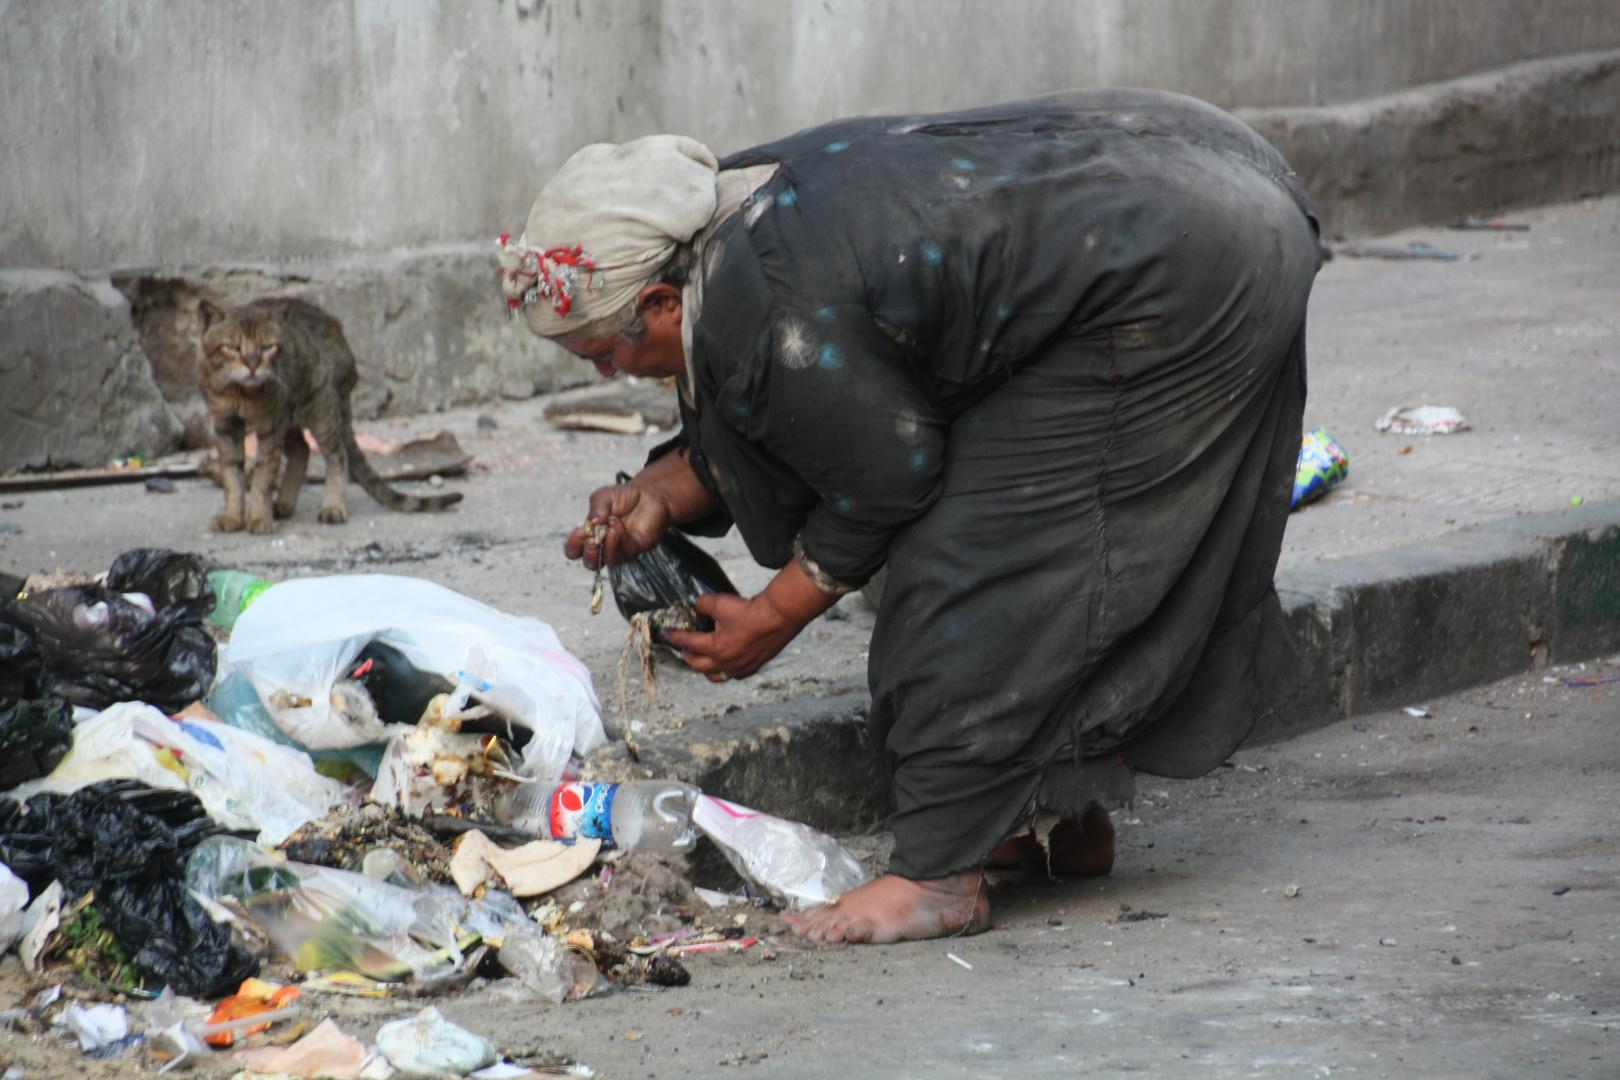 Armut in Ägypten